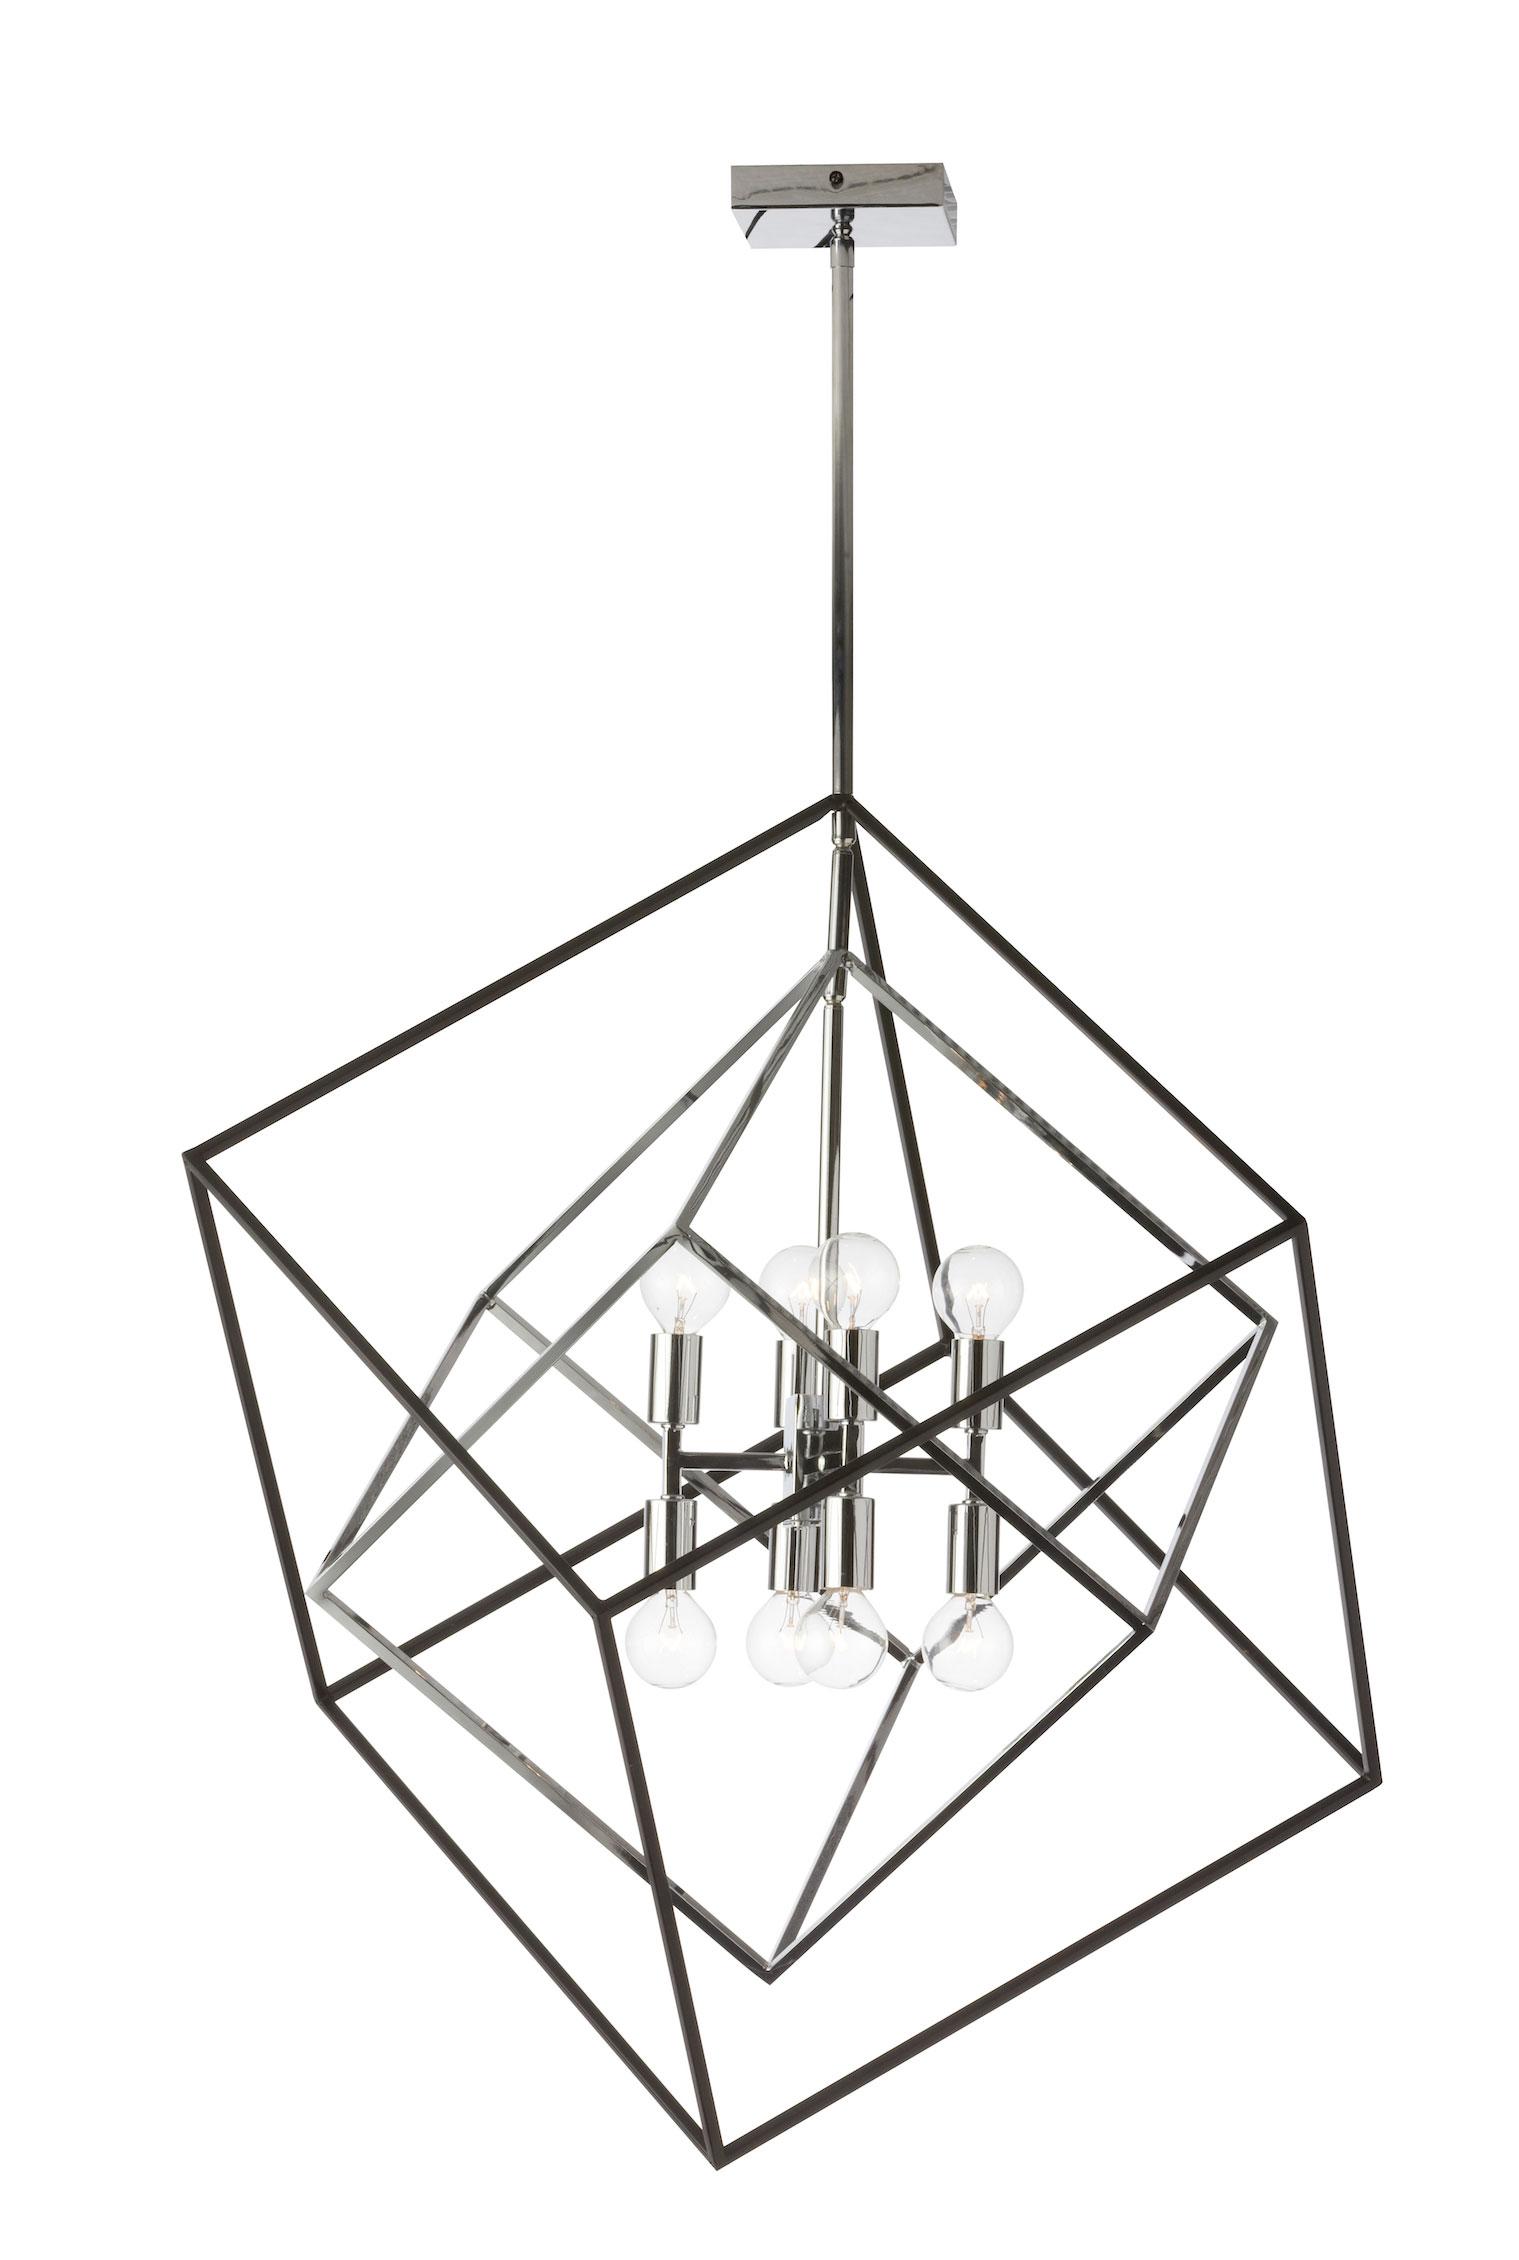 Pendant lighting kap 278p pc mb pendant lighting industrial dainolite kap 278p pc mb mozeypictures Images